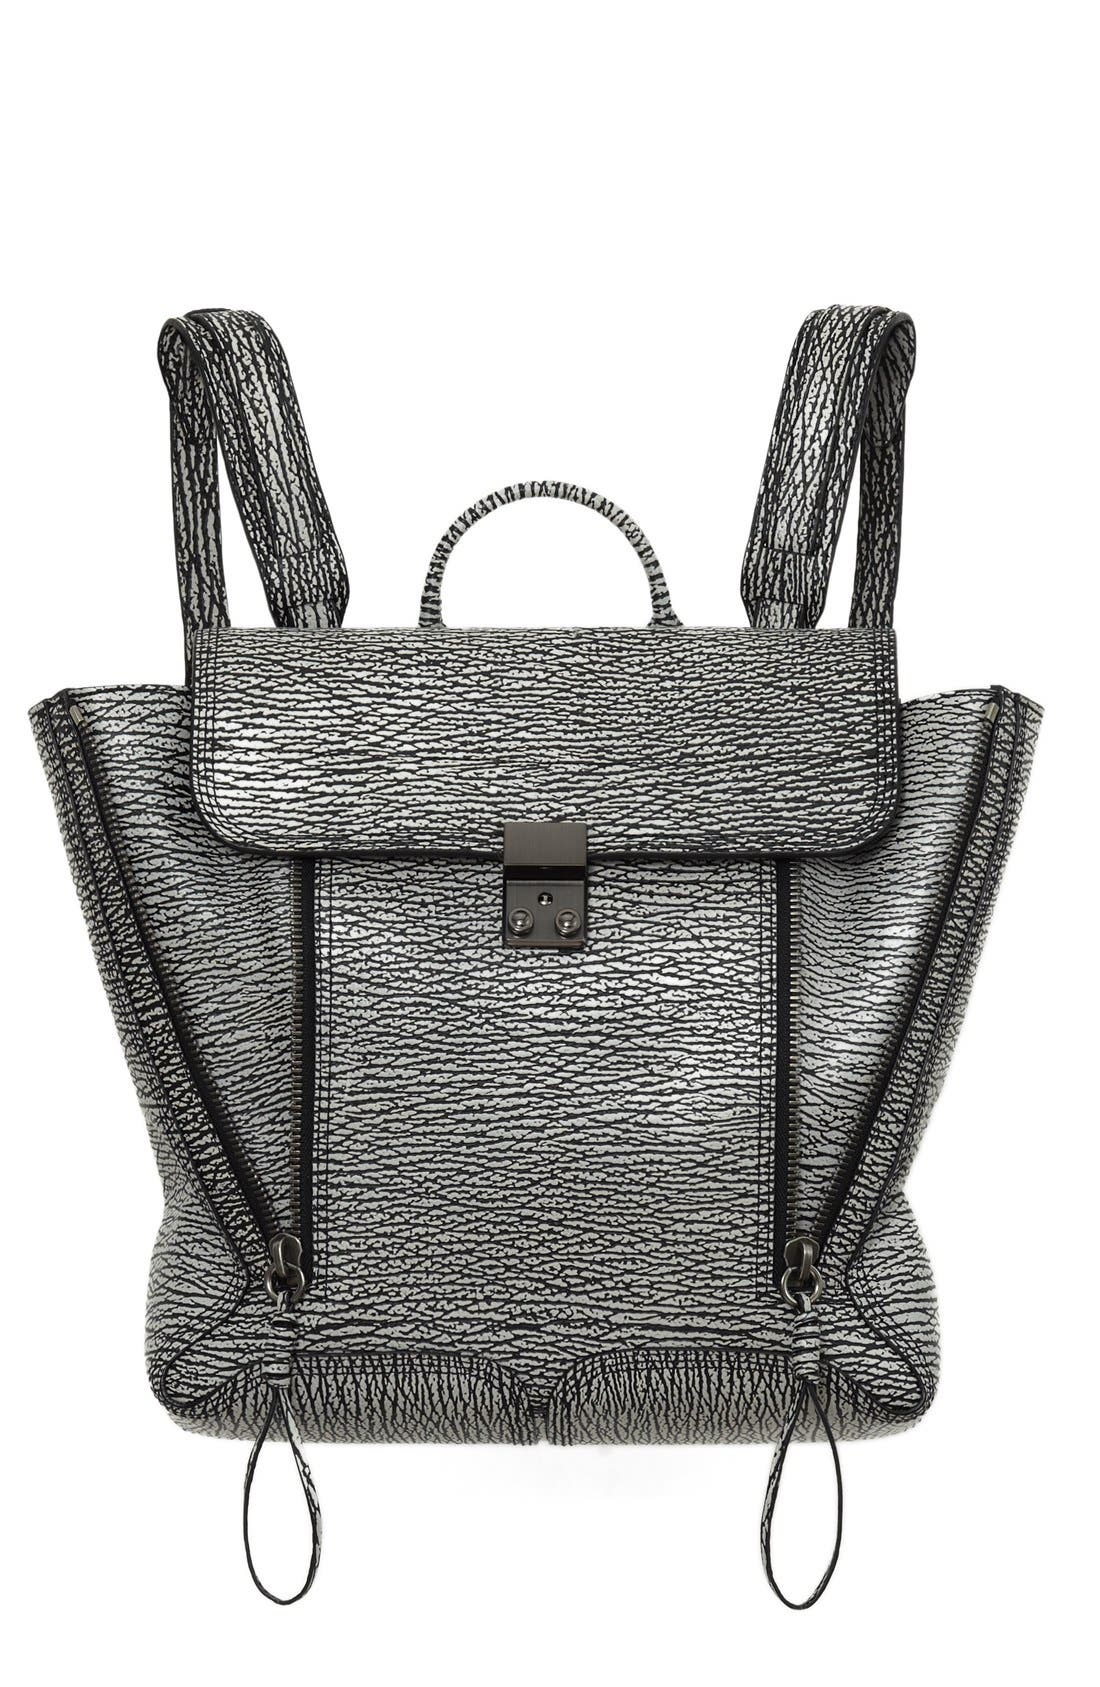 Main Image - 3.1 Phillip Lim 'Pashli' Shark Embossed Leather Backpack